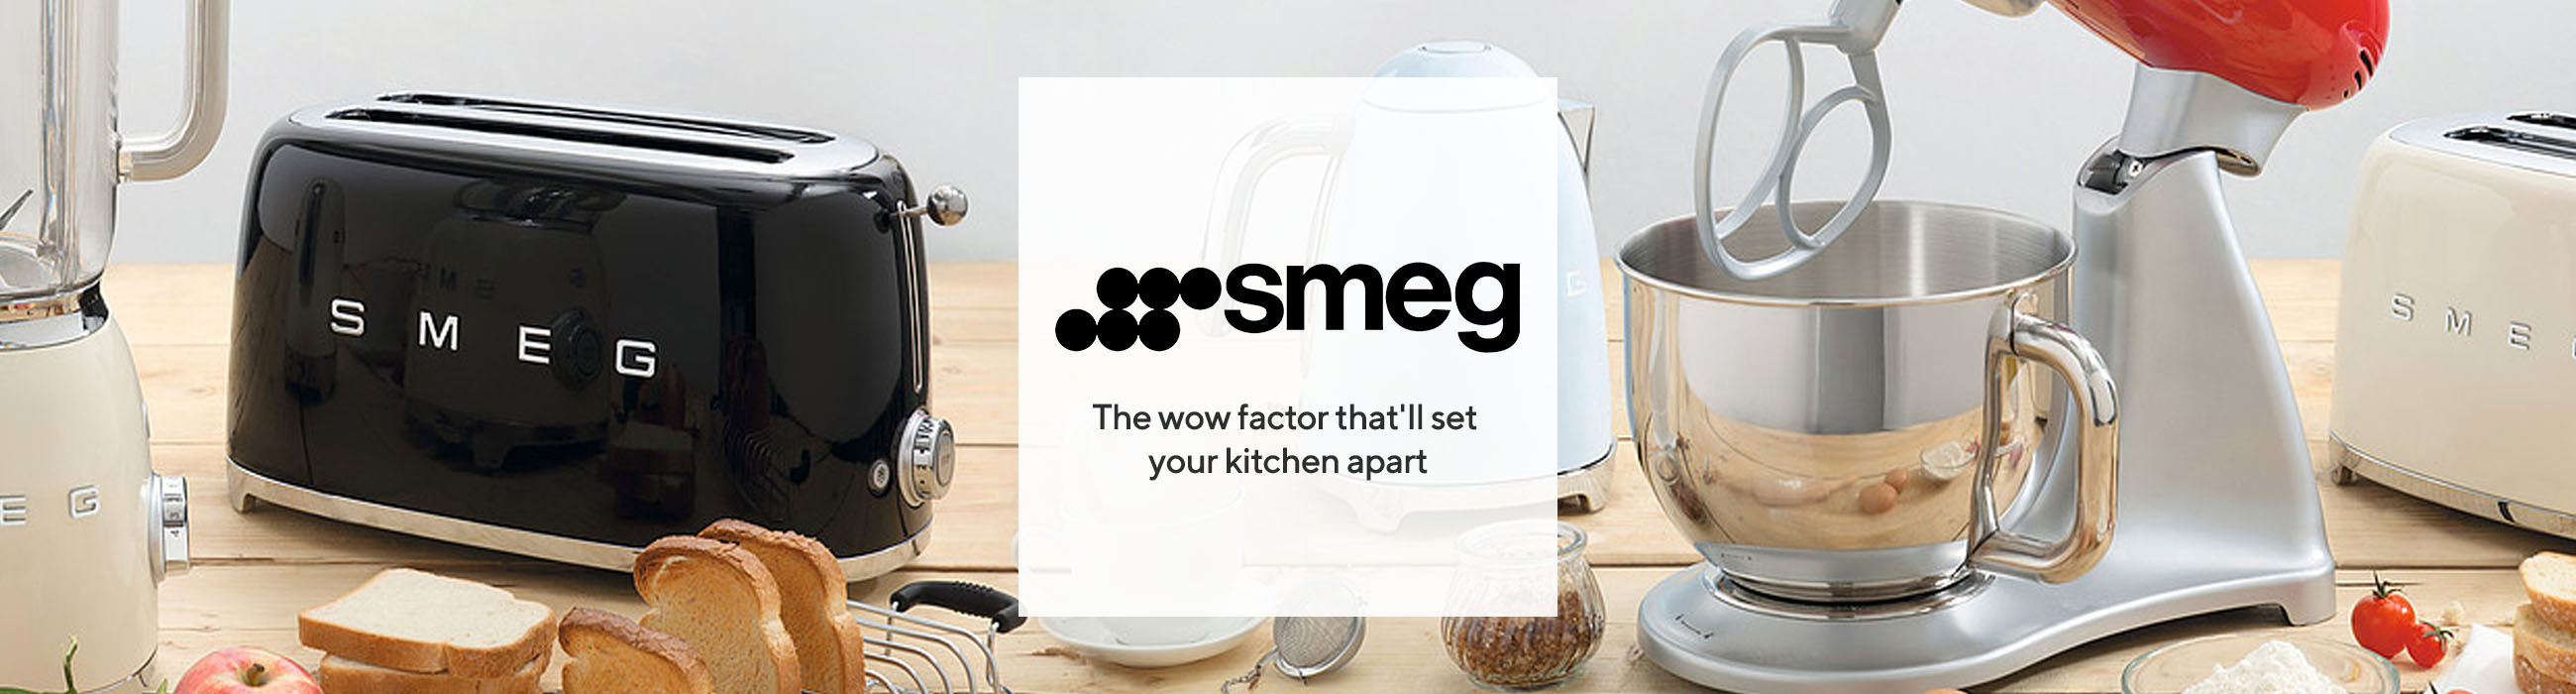 Smeg  The wow factor that'll set your kitchen apart